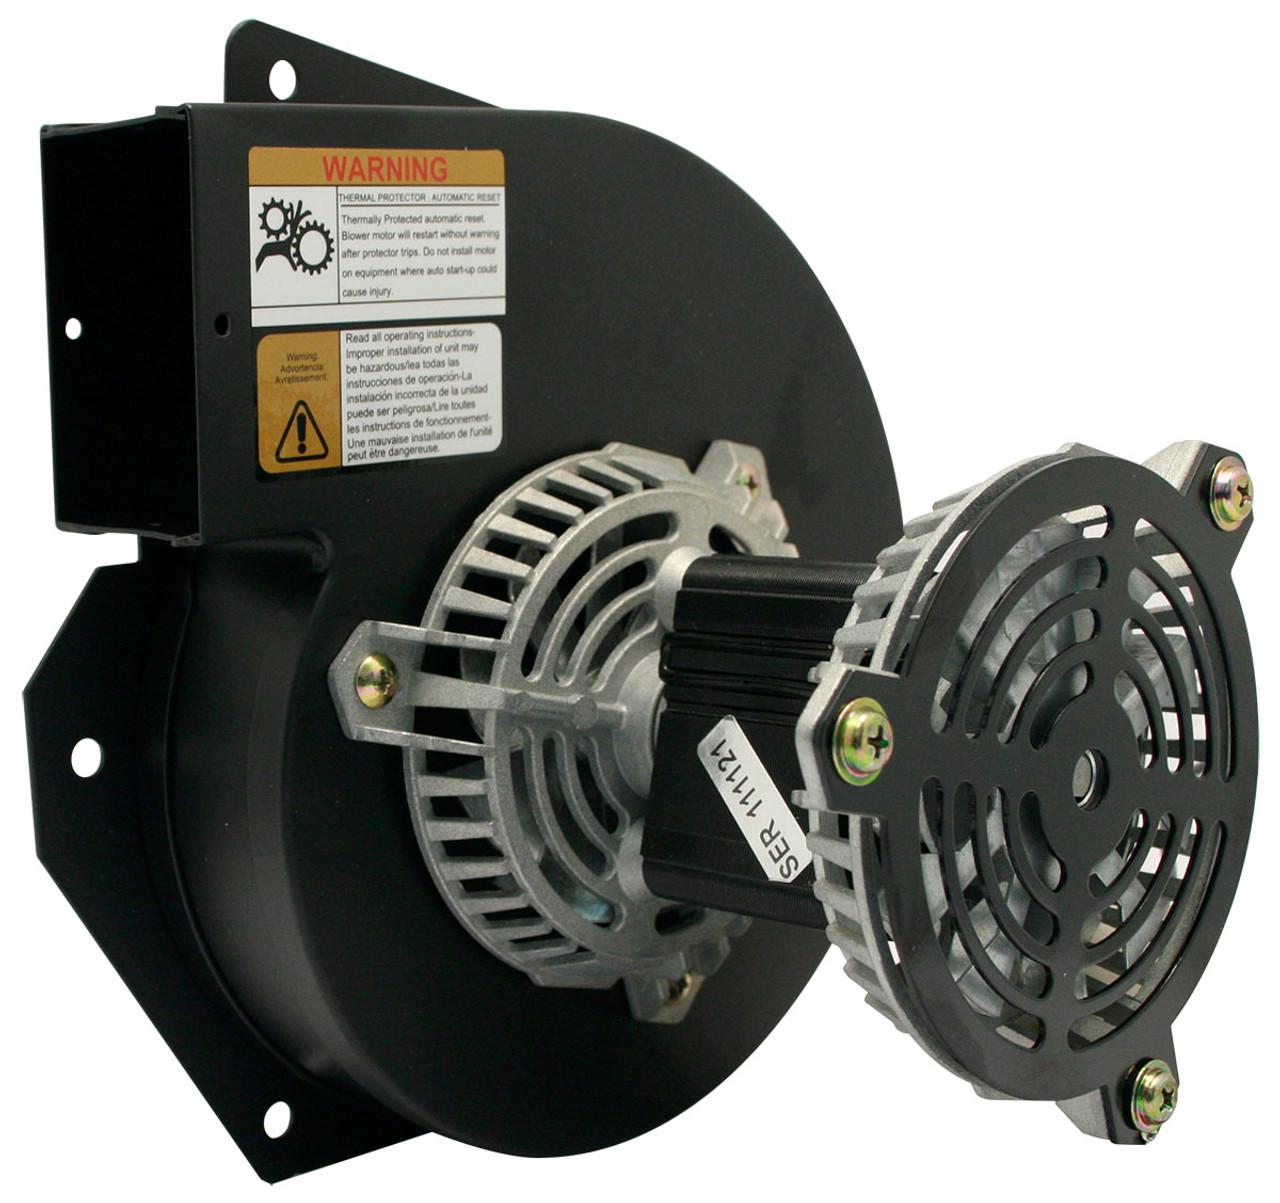 medium resolution of trane furnace draft inducer blower 7002 2558 d330787p01 blw473 rotom fb rfb337